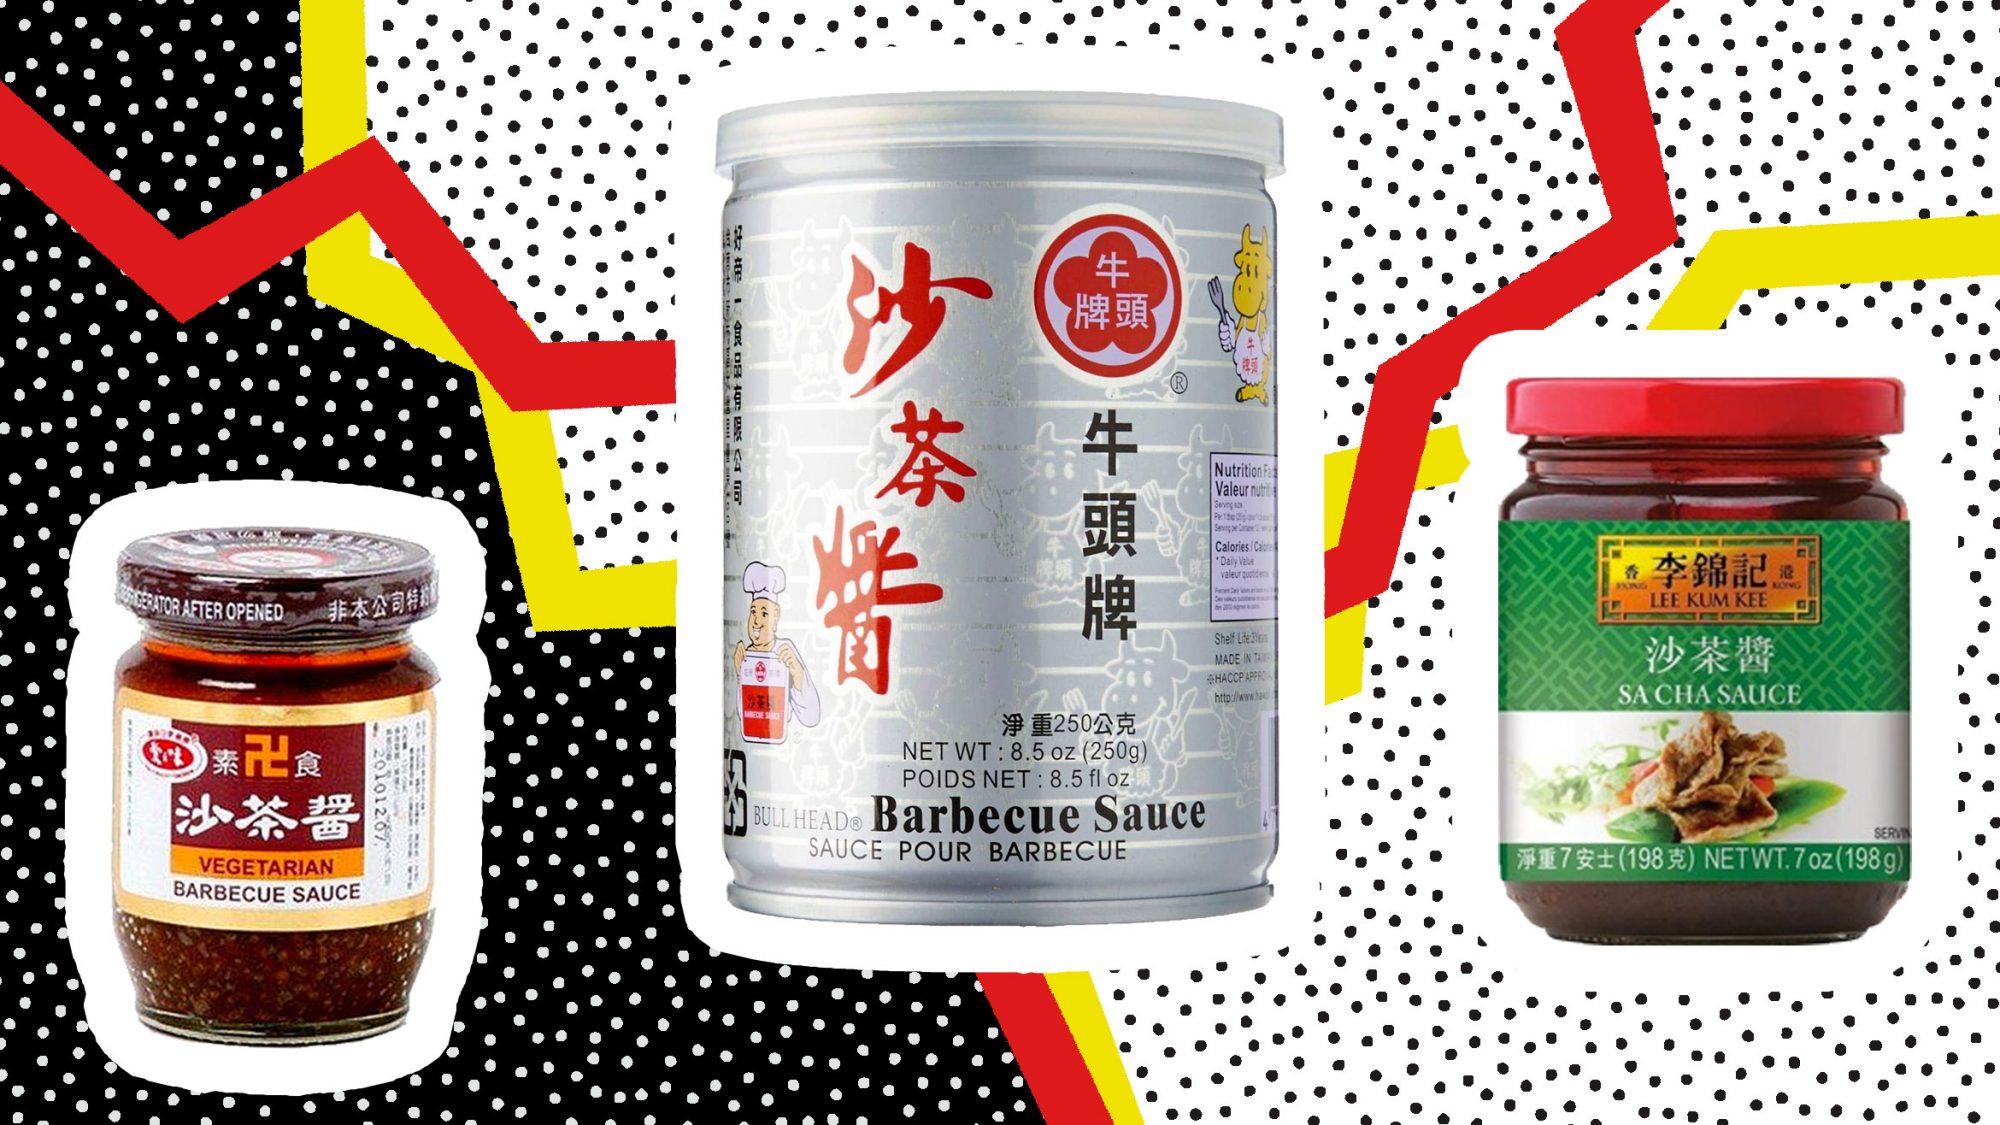 Article-Shacha-Sauce-AGV-Bull-Head-Lee-Kum-Kee